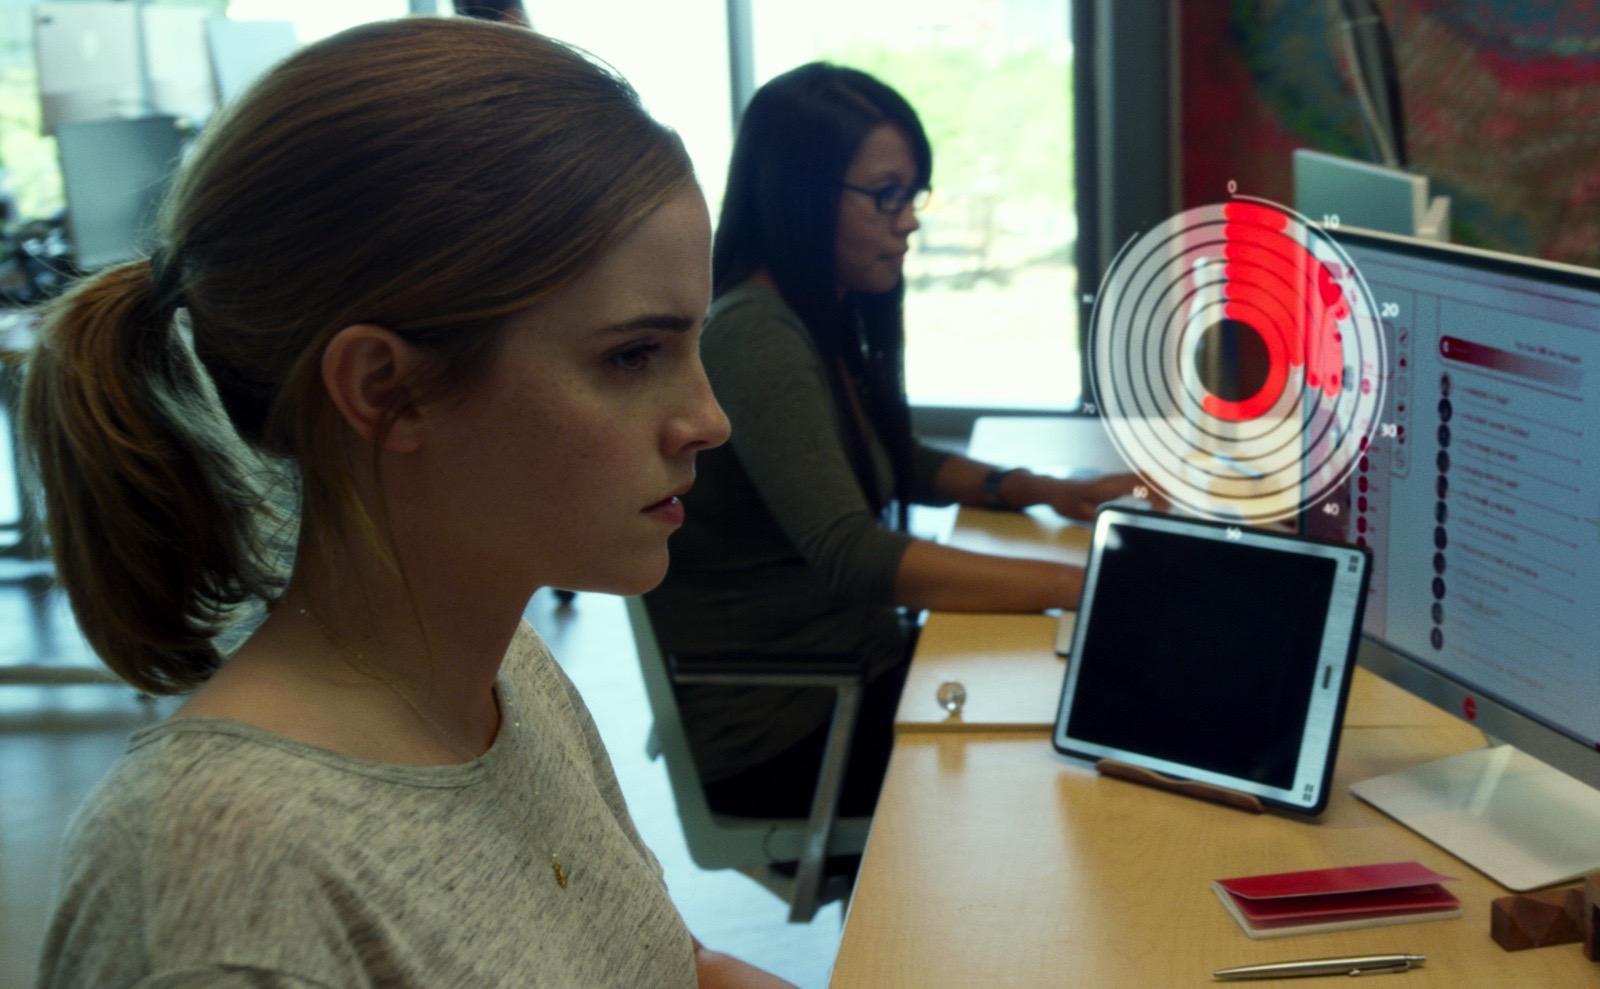 'The Circle' takes anti-tech paranoia to ludicrous heights